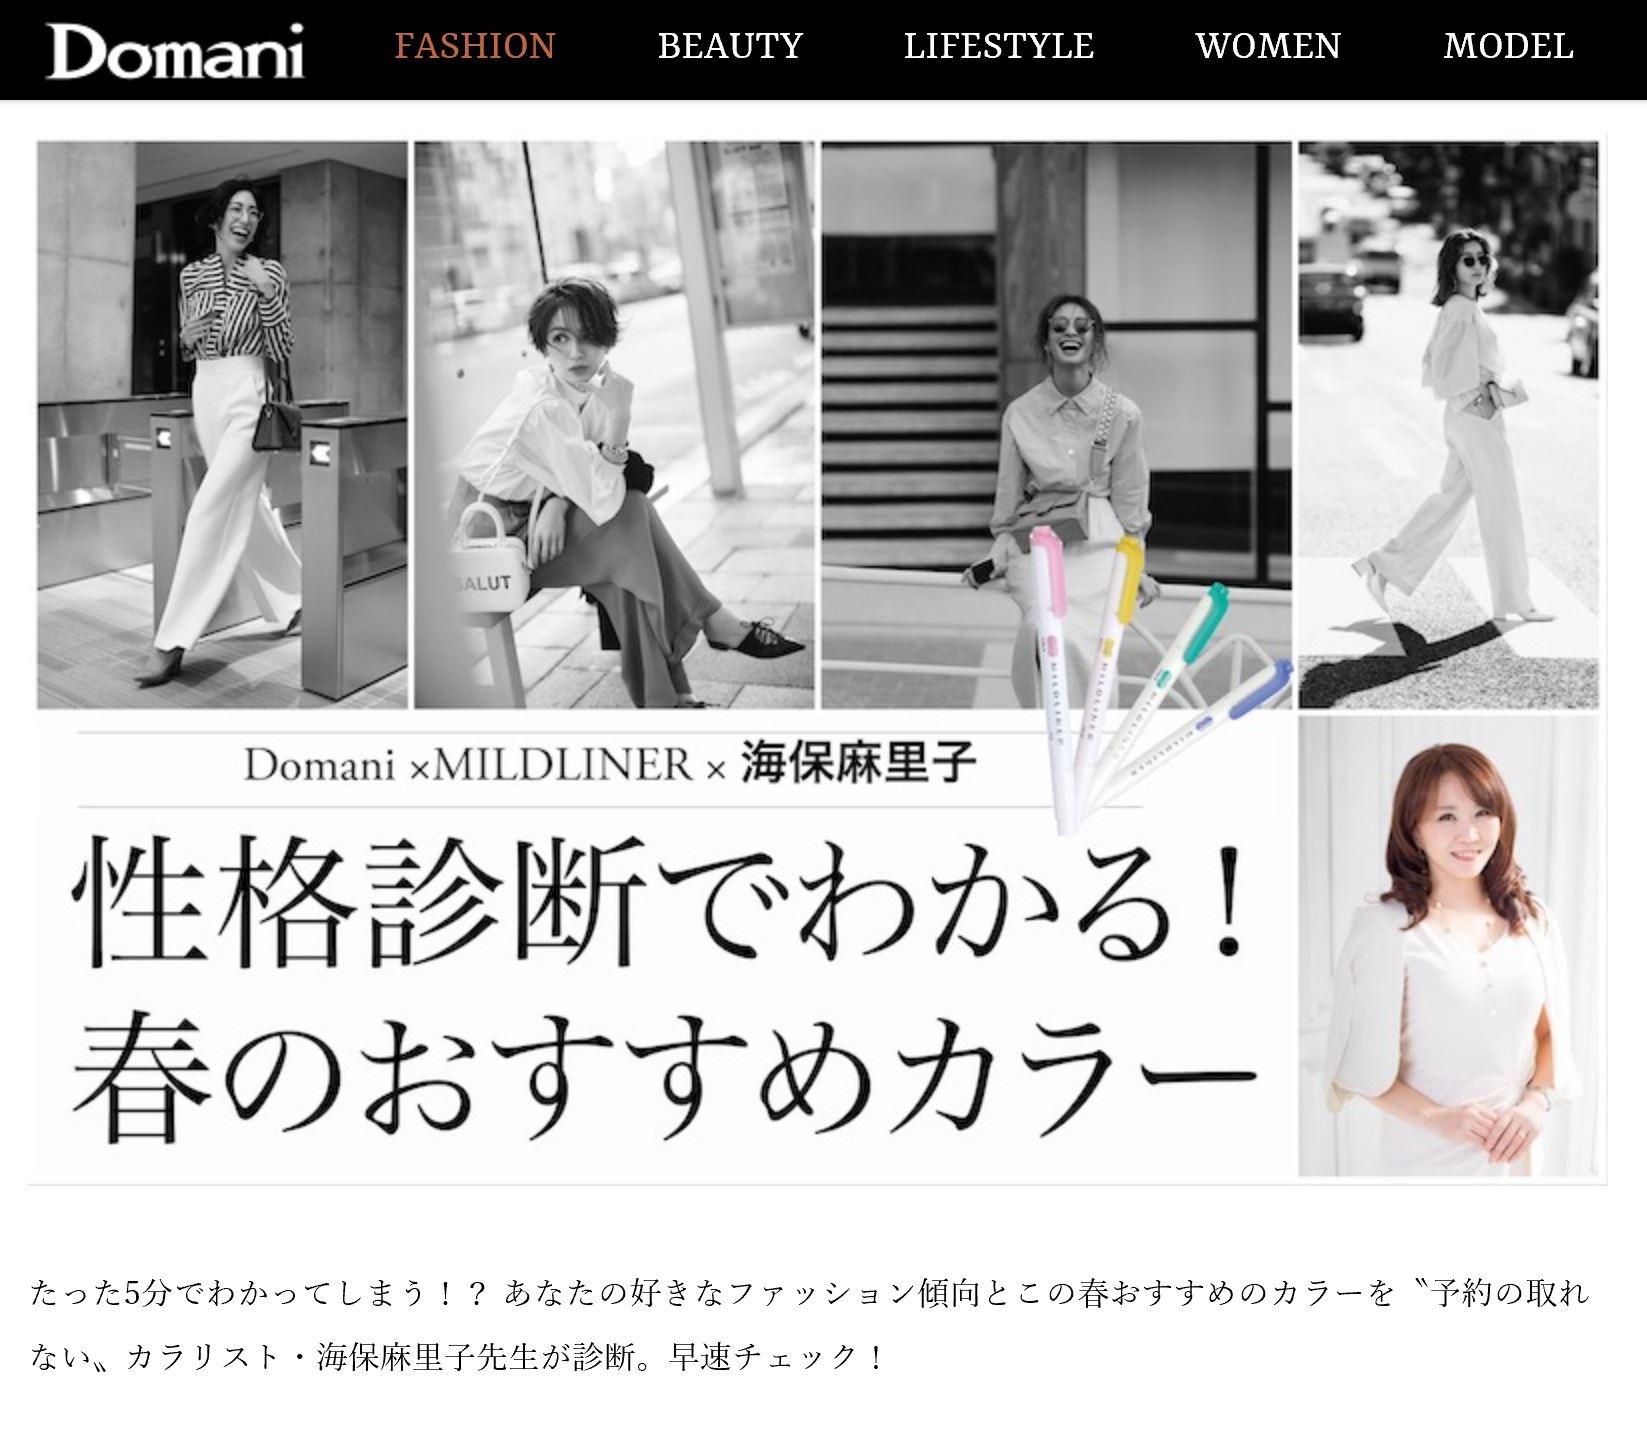 ドマーニ 性格診断 by海保麻里子